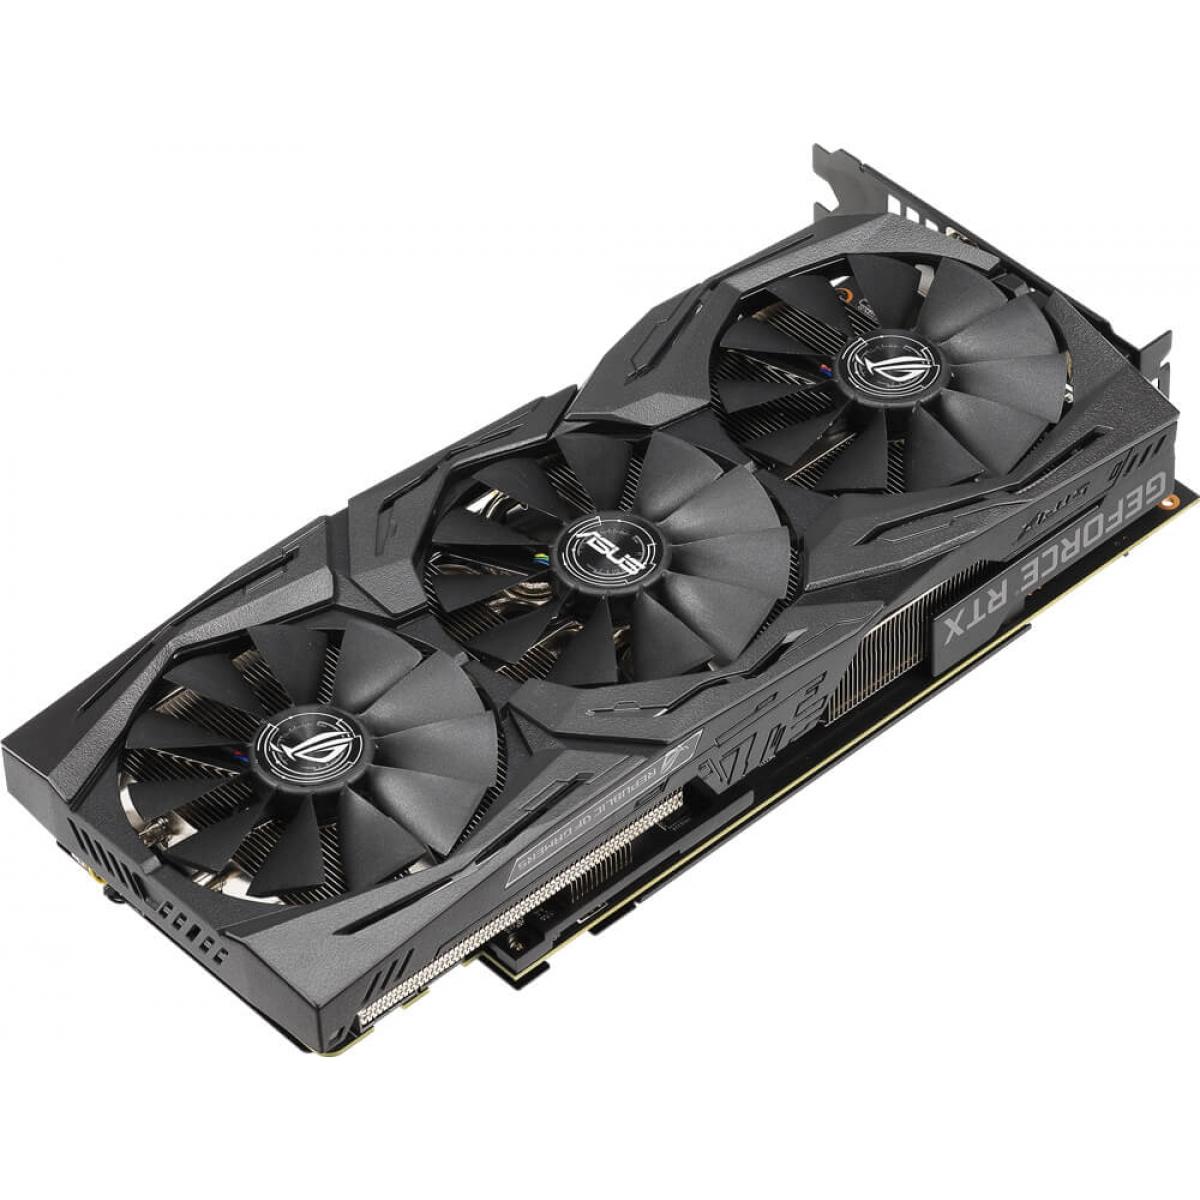 Placa de Vídeo Asus Geforce RTX 2070 ROG STRIX GAMING OC, 8GB GDDR6, 256Bit, ROG-STRIX-RTX2070-O8G-GAMING